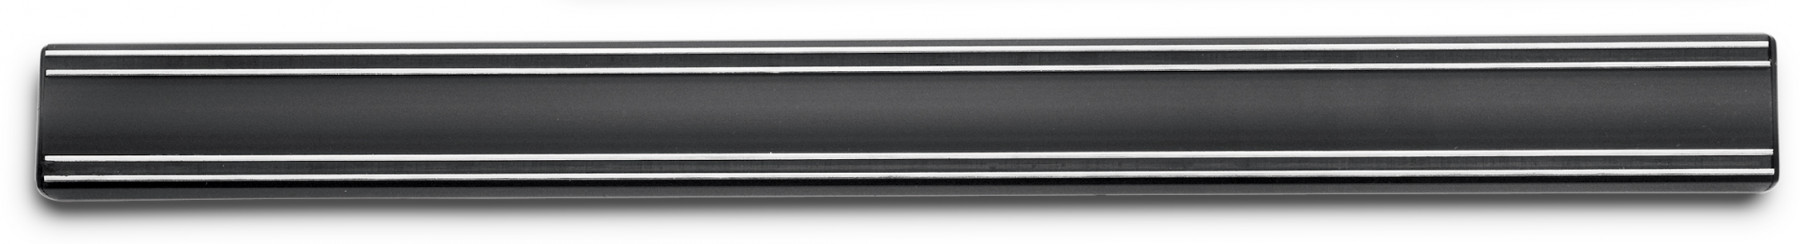 Wüsthof Dreizack Magnethalter schwarz 50cm